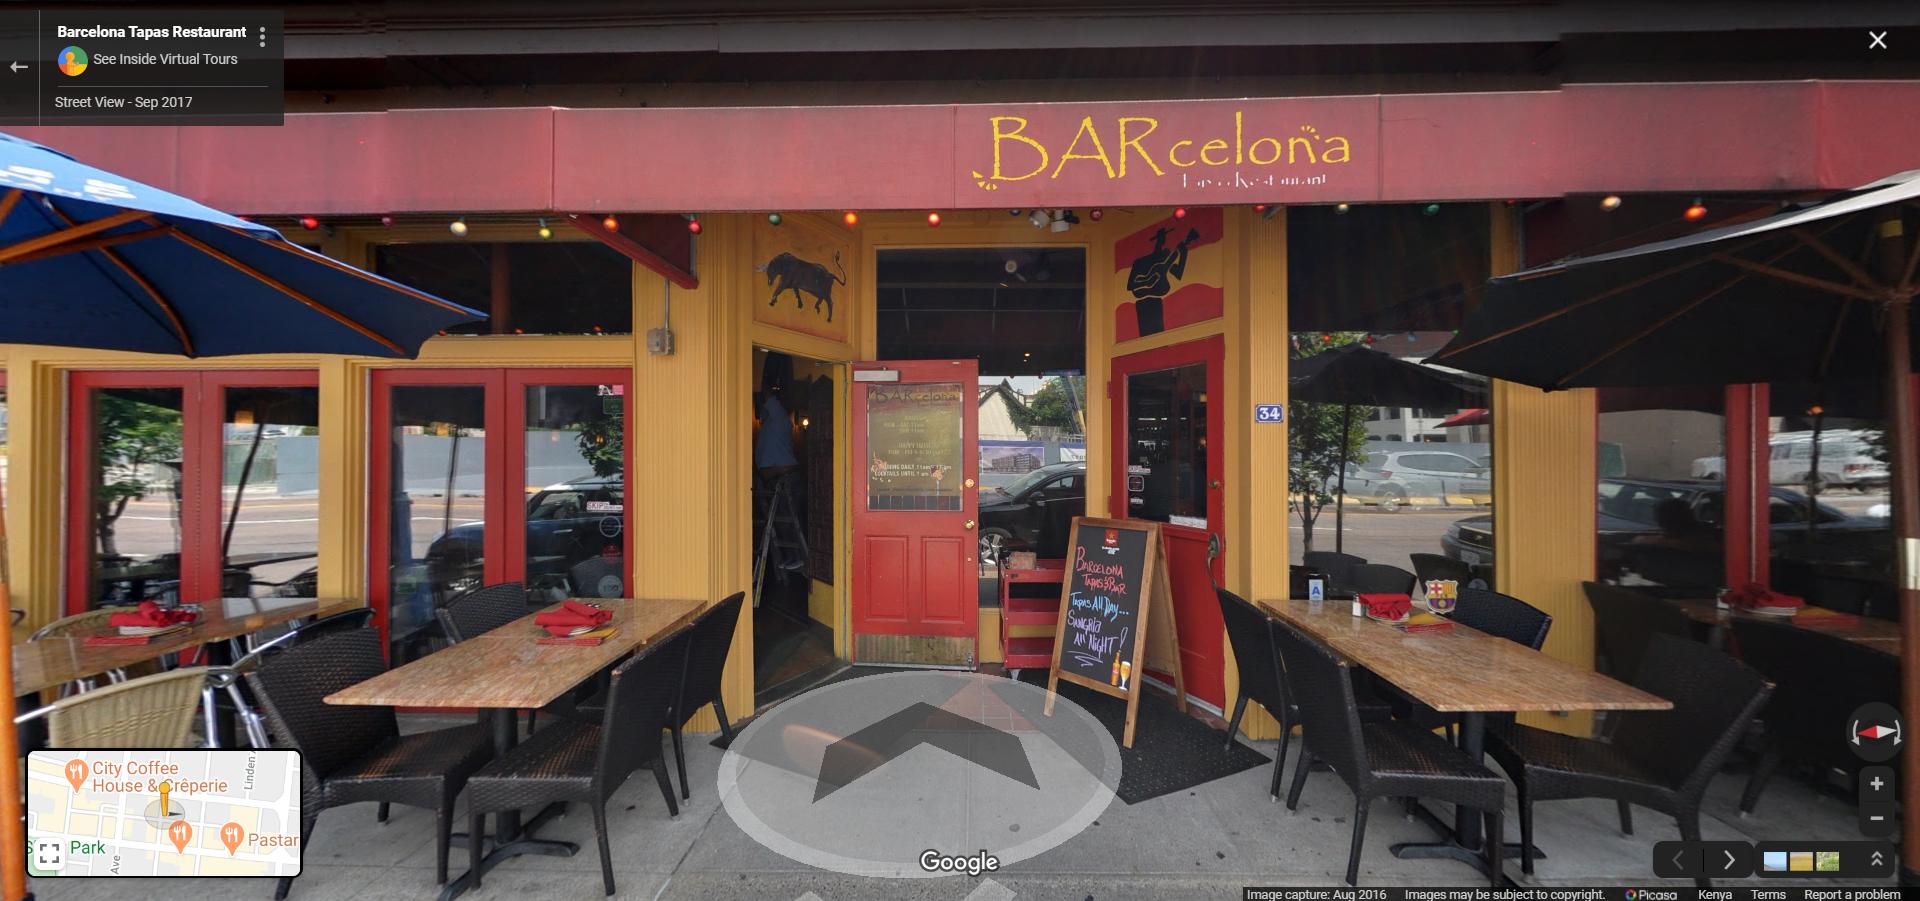 Barcelona Tapas Restaurant - St. Louis, MO - Clayton